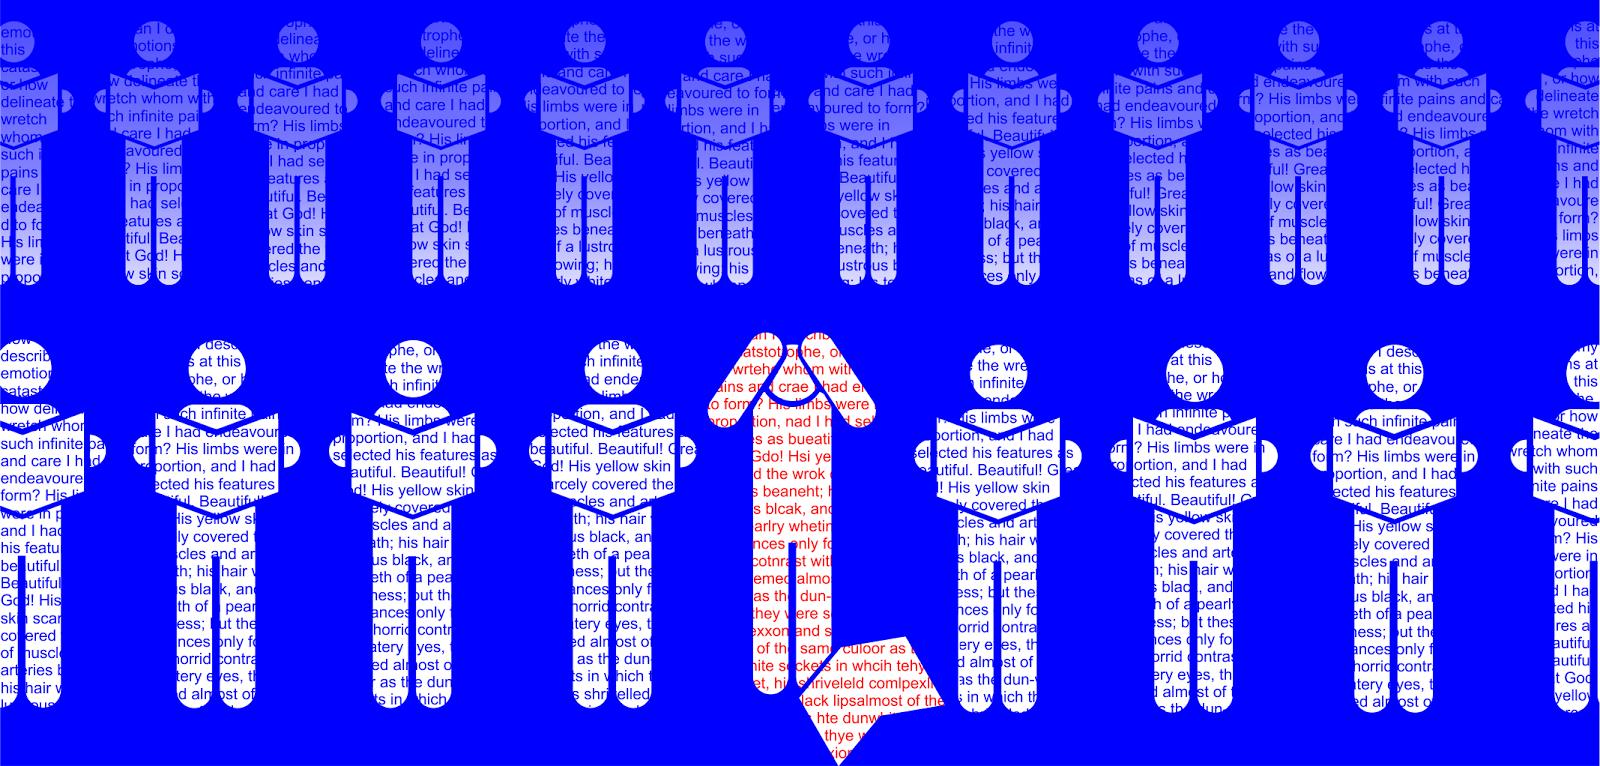 Задачник по геометрии 10 класс атанасян онлайн читать